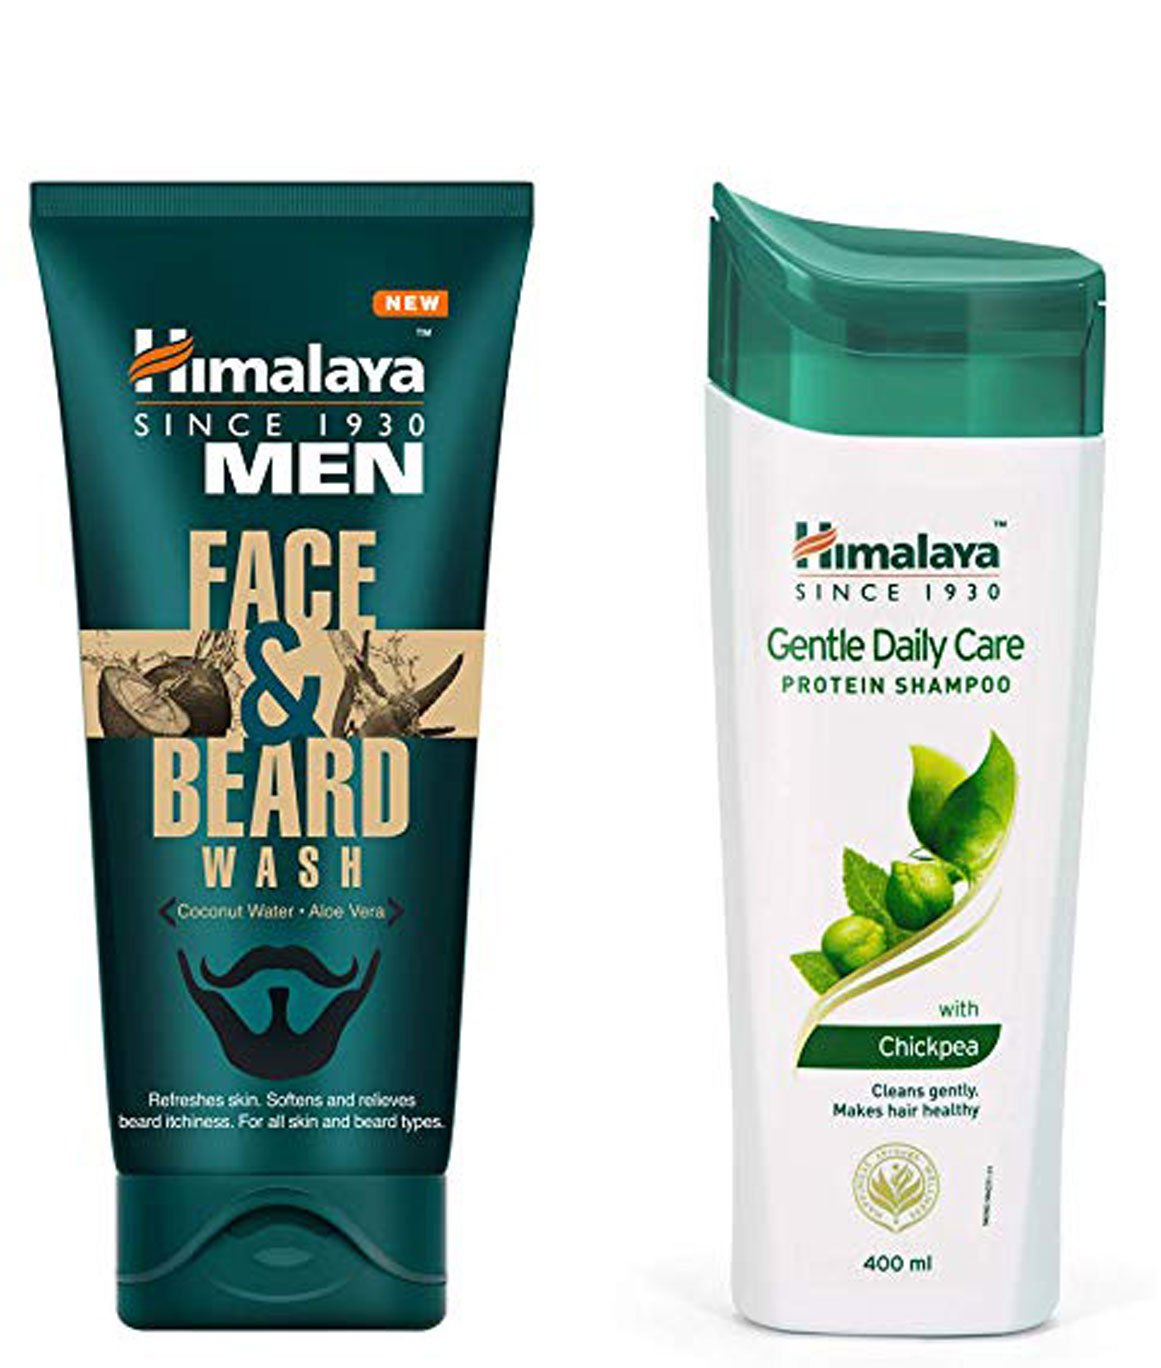 Himalaya Men Face And Beard Wash 80ml and Himalaya Herbals Protein Shampoo Gentle Daily Care 400ml